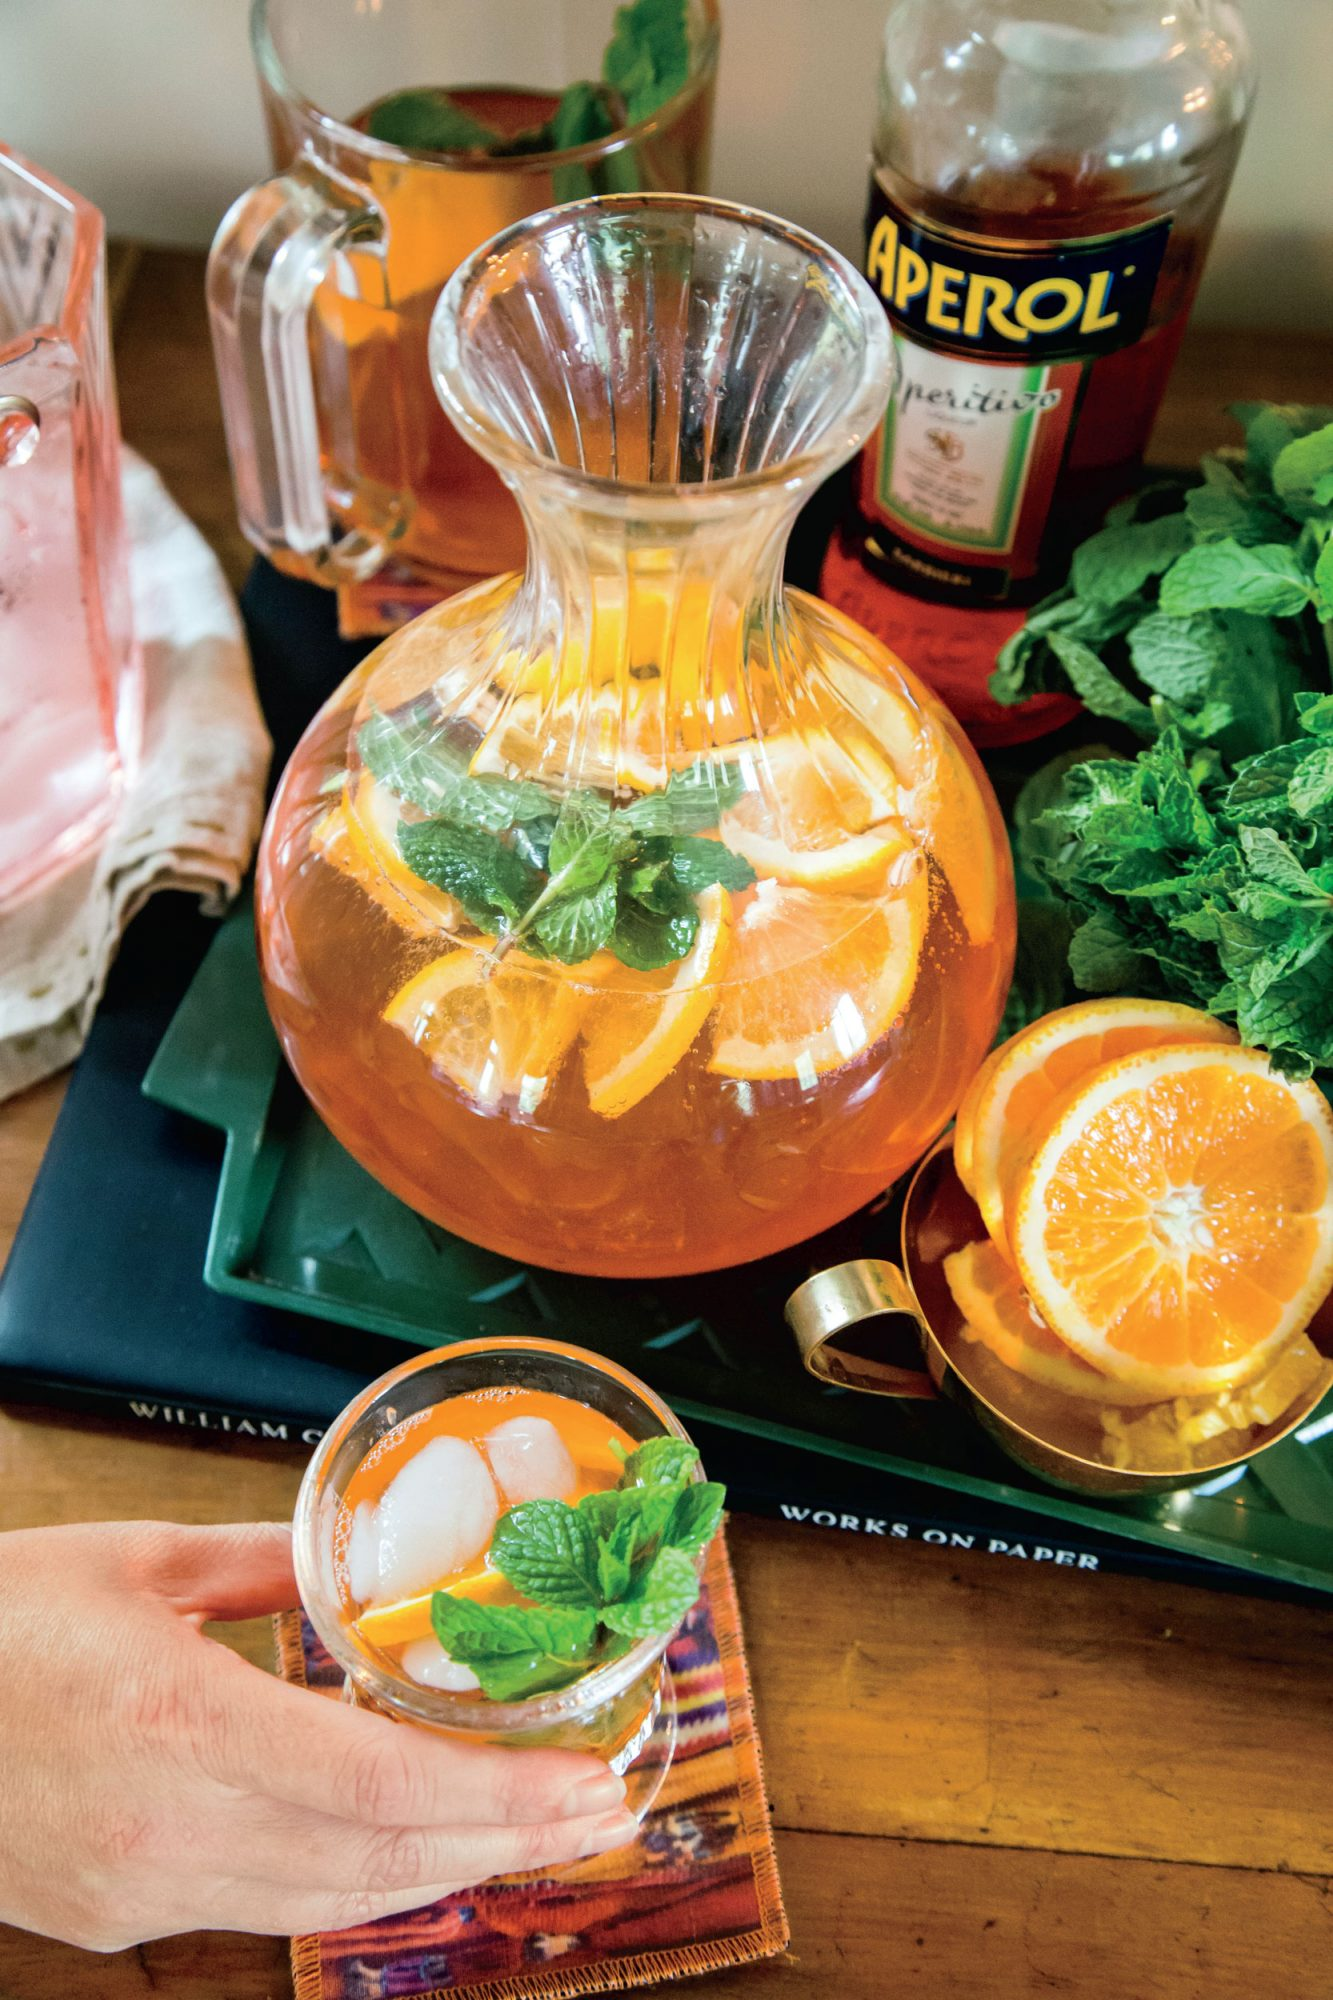 Aperol and Blood Orange-Mint Spritz image